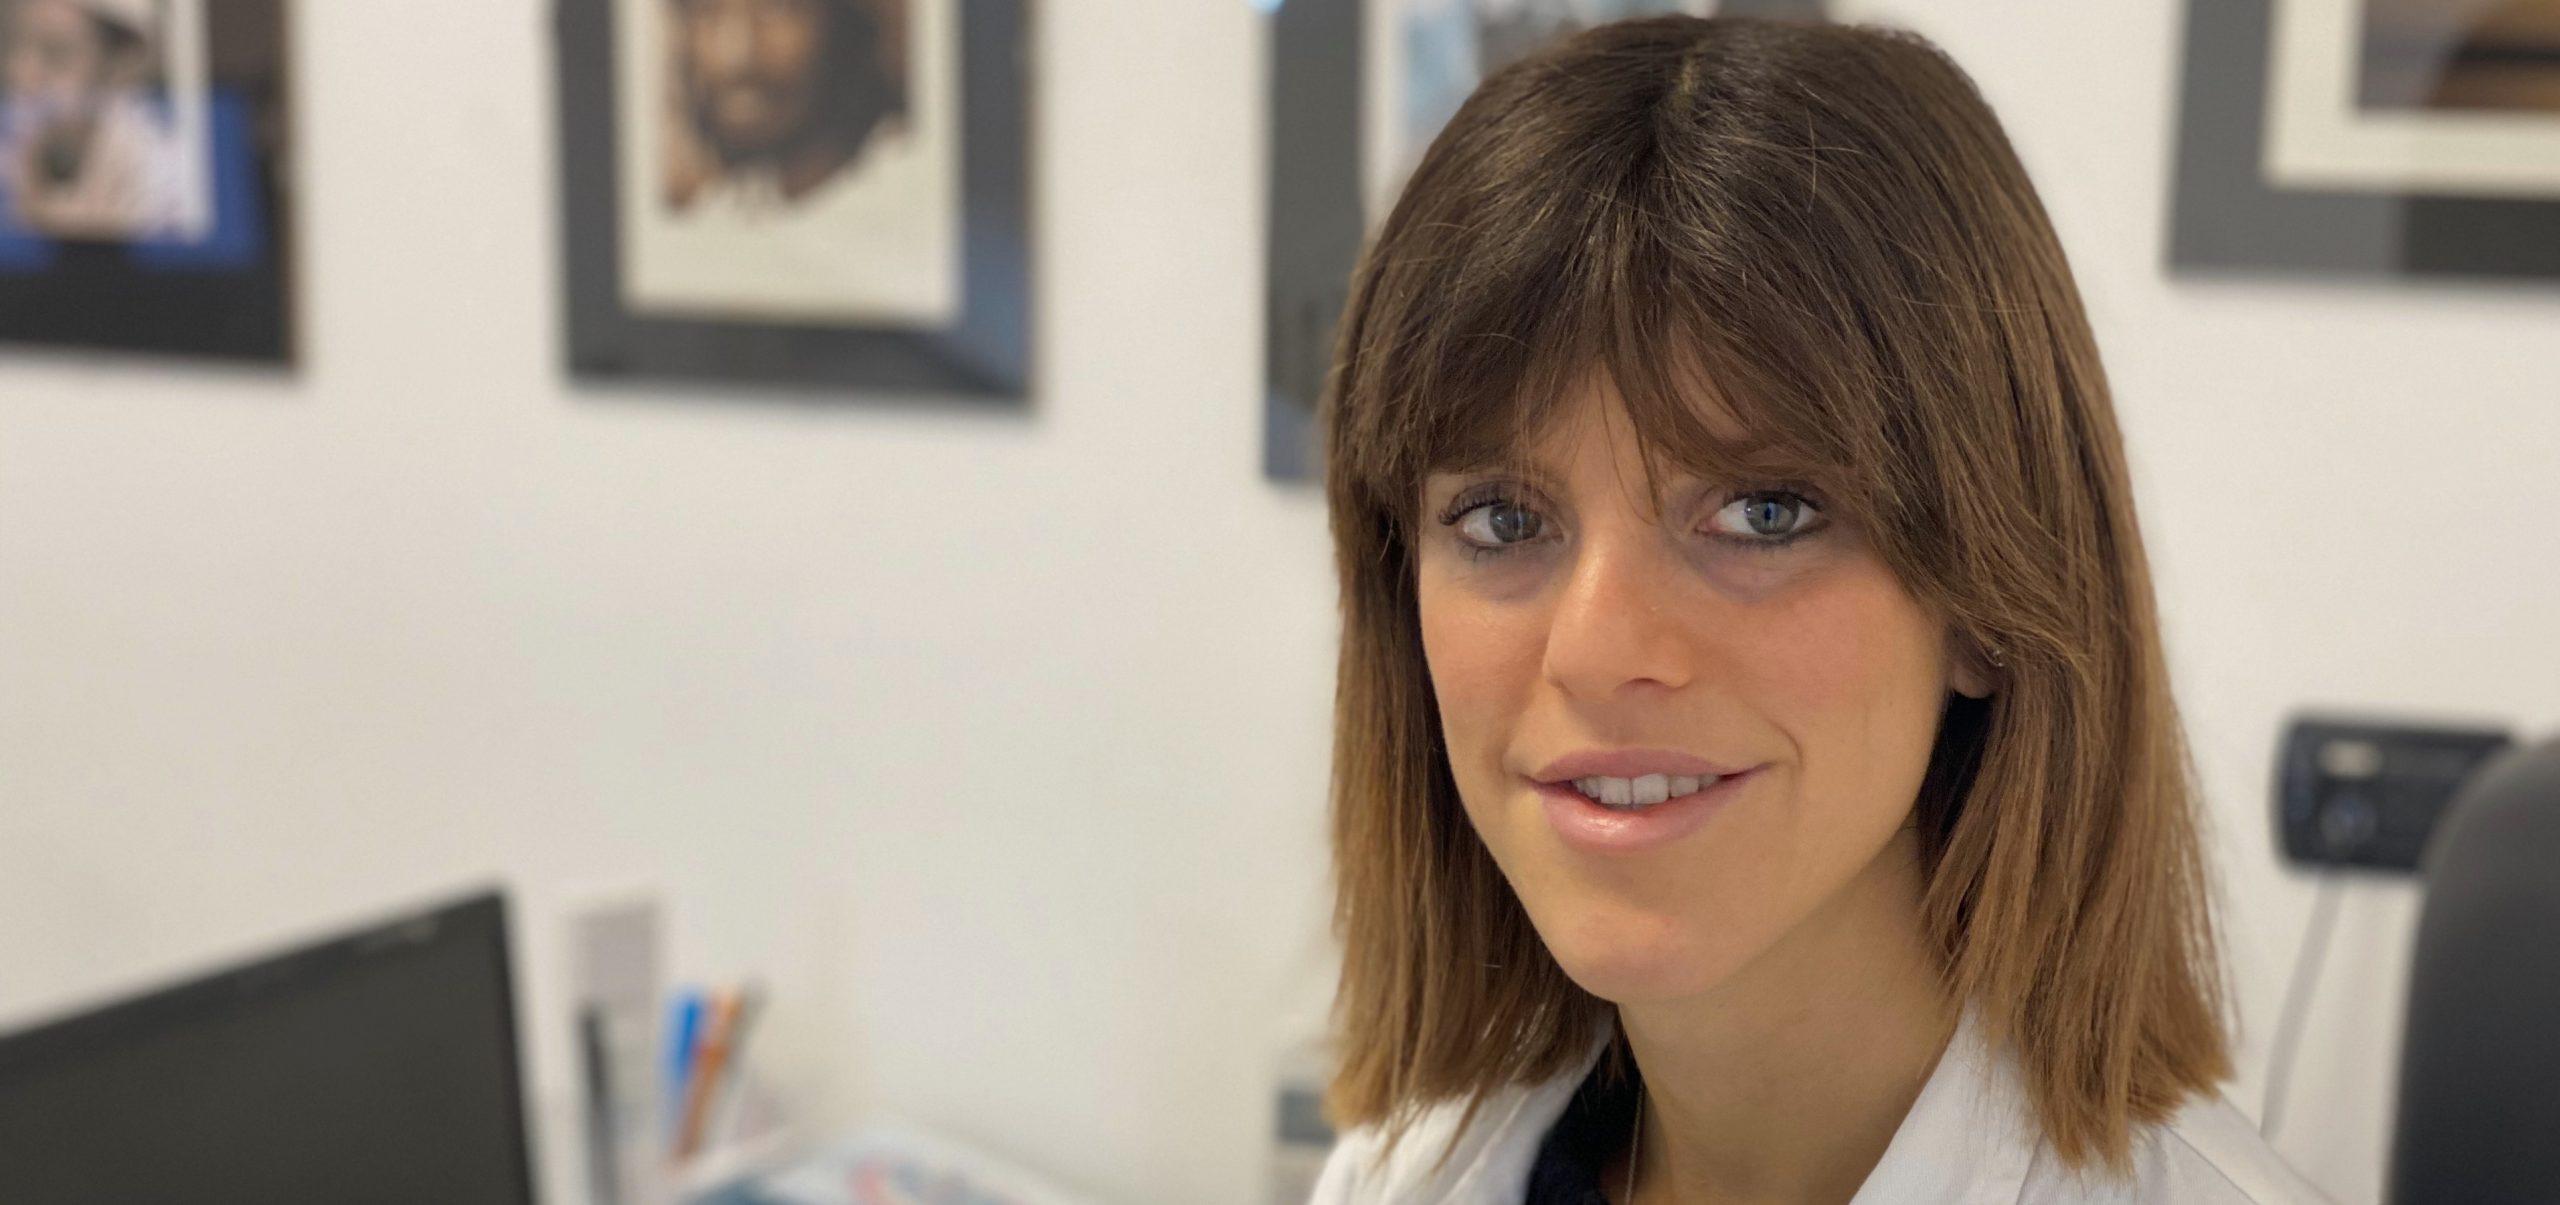 Dott.ssa Giulia Astolfi